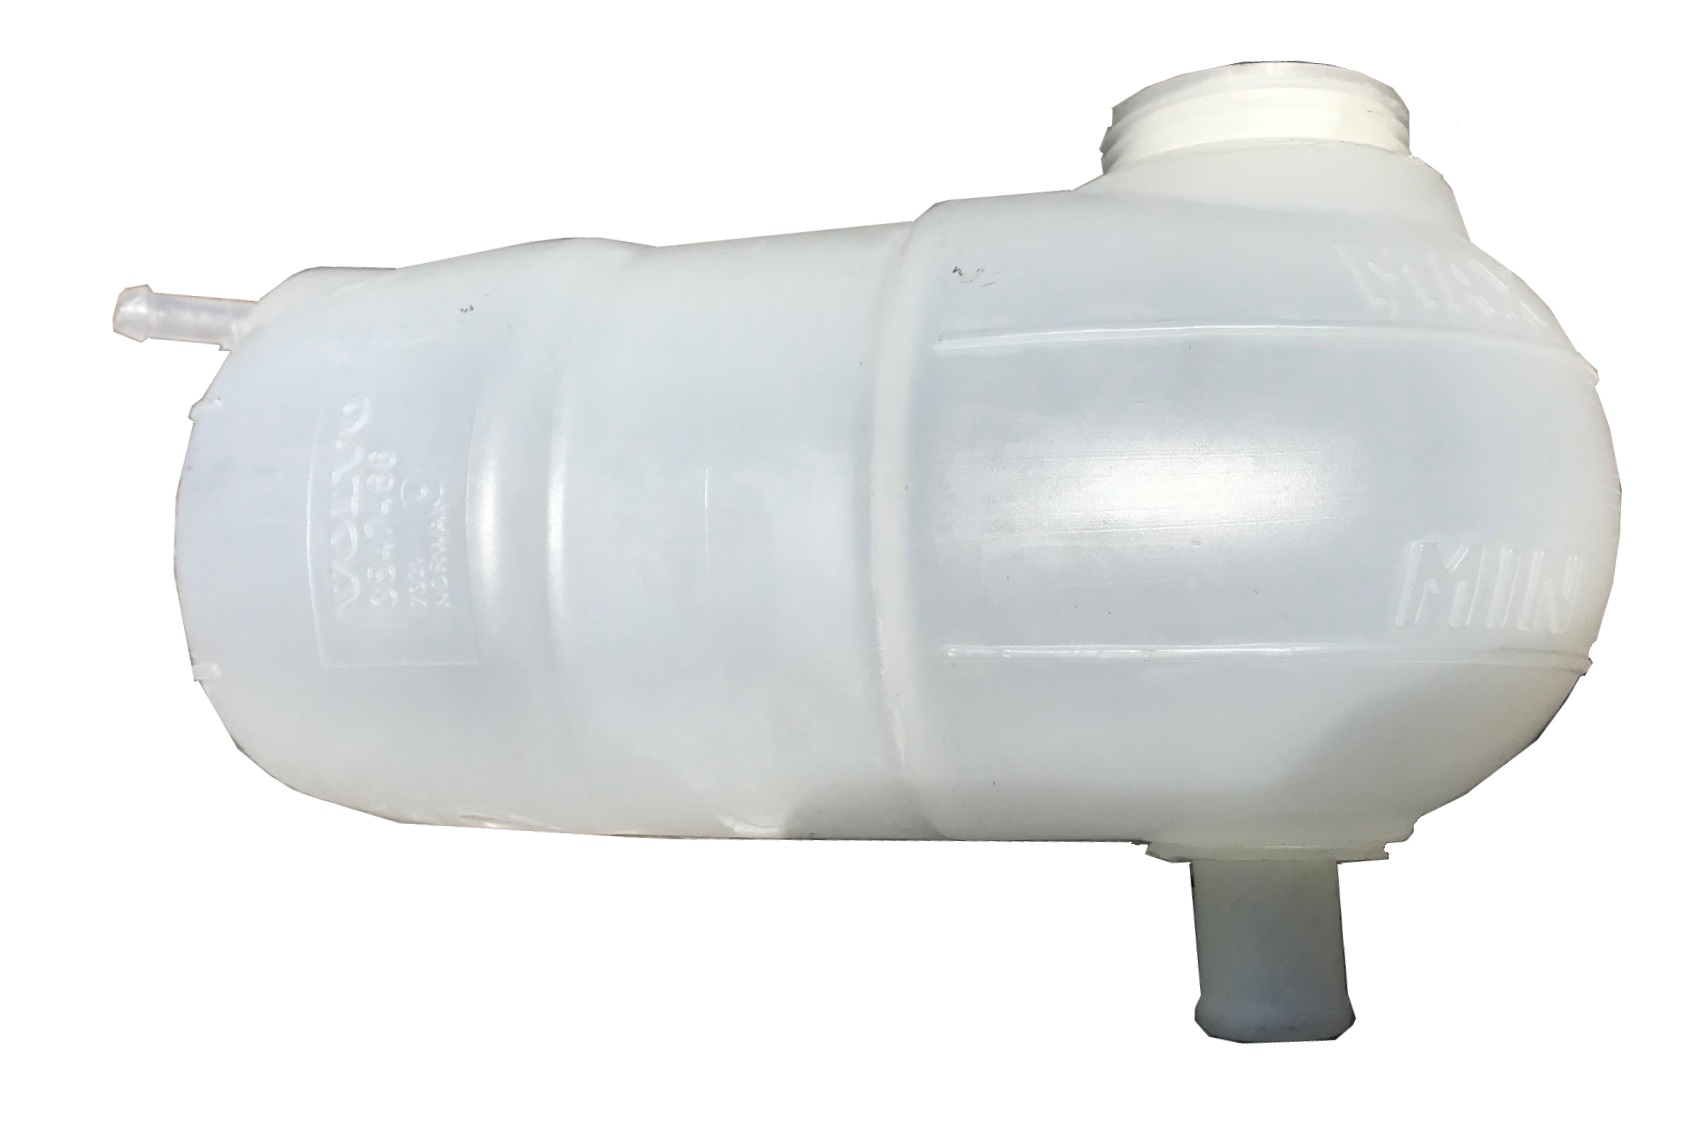 Expansionstank 2000-serien, MD11, 17, 21